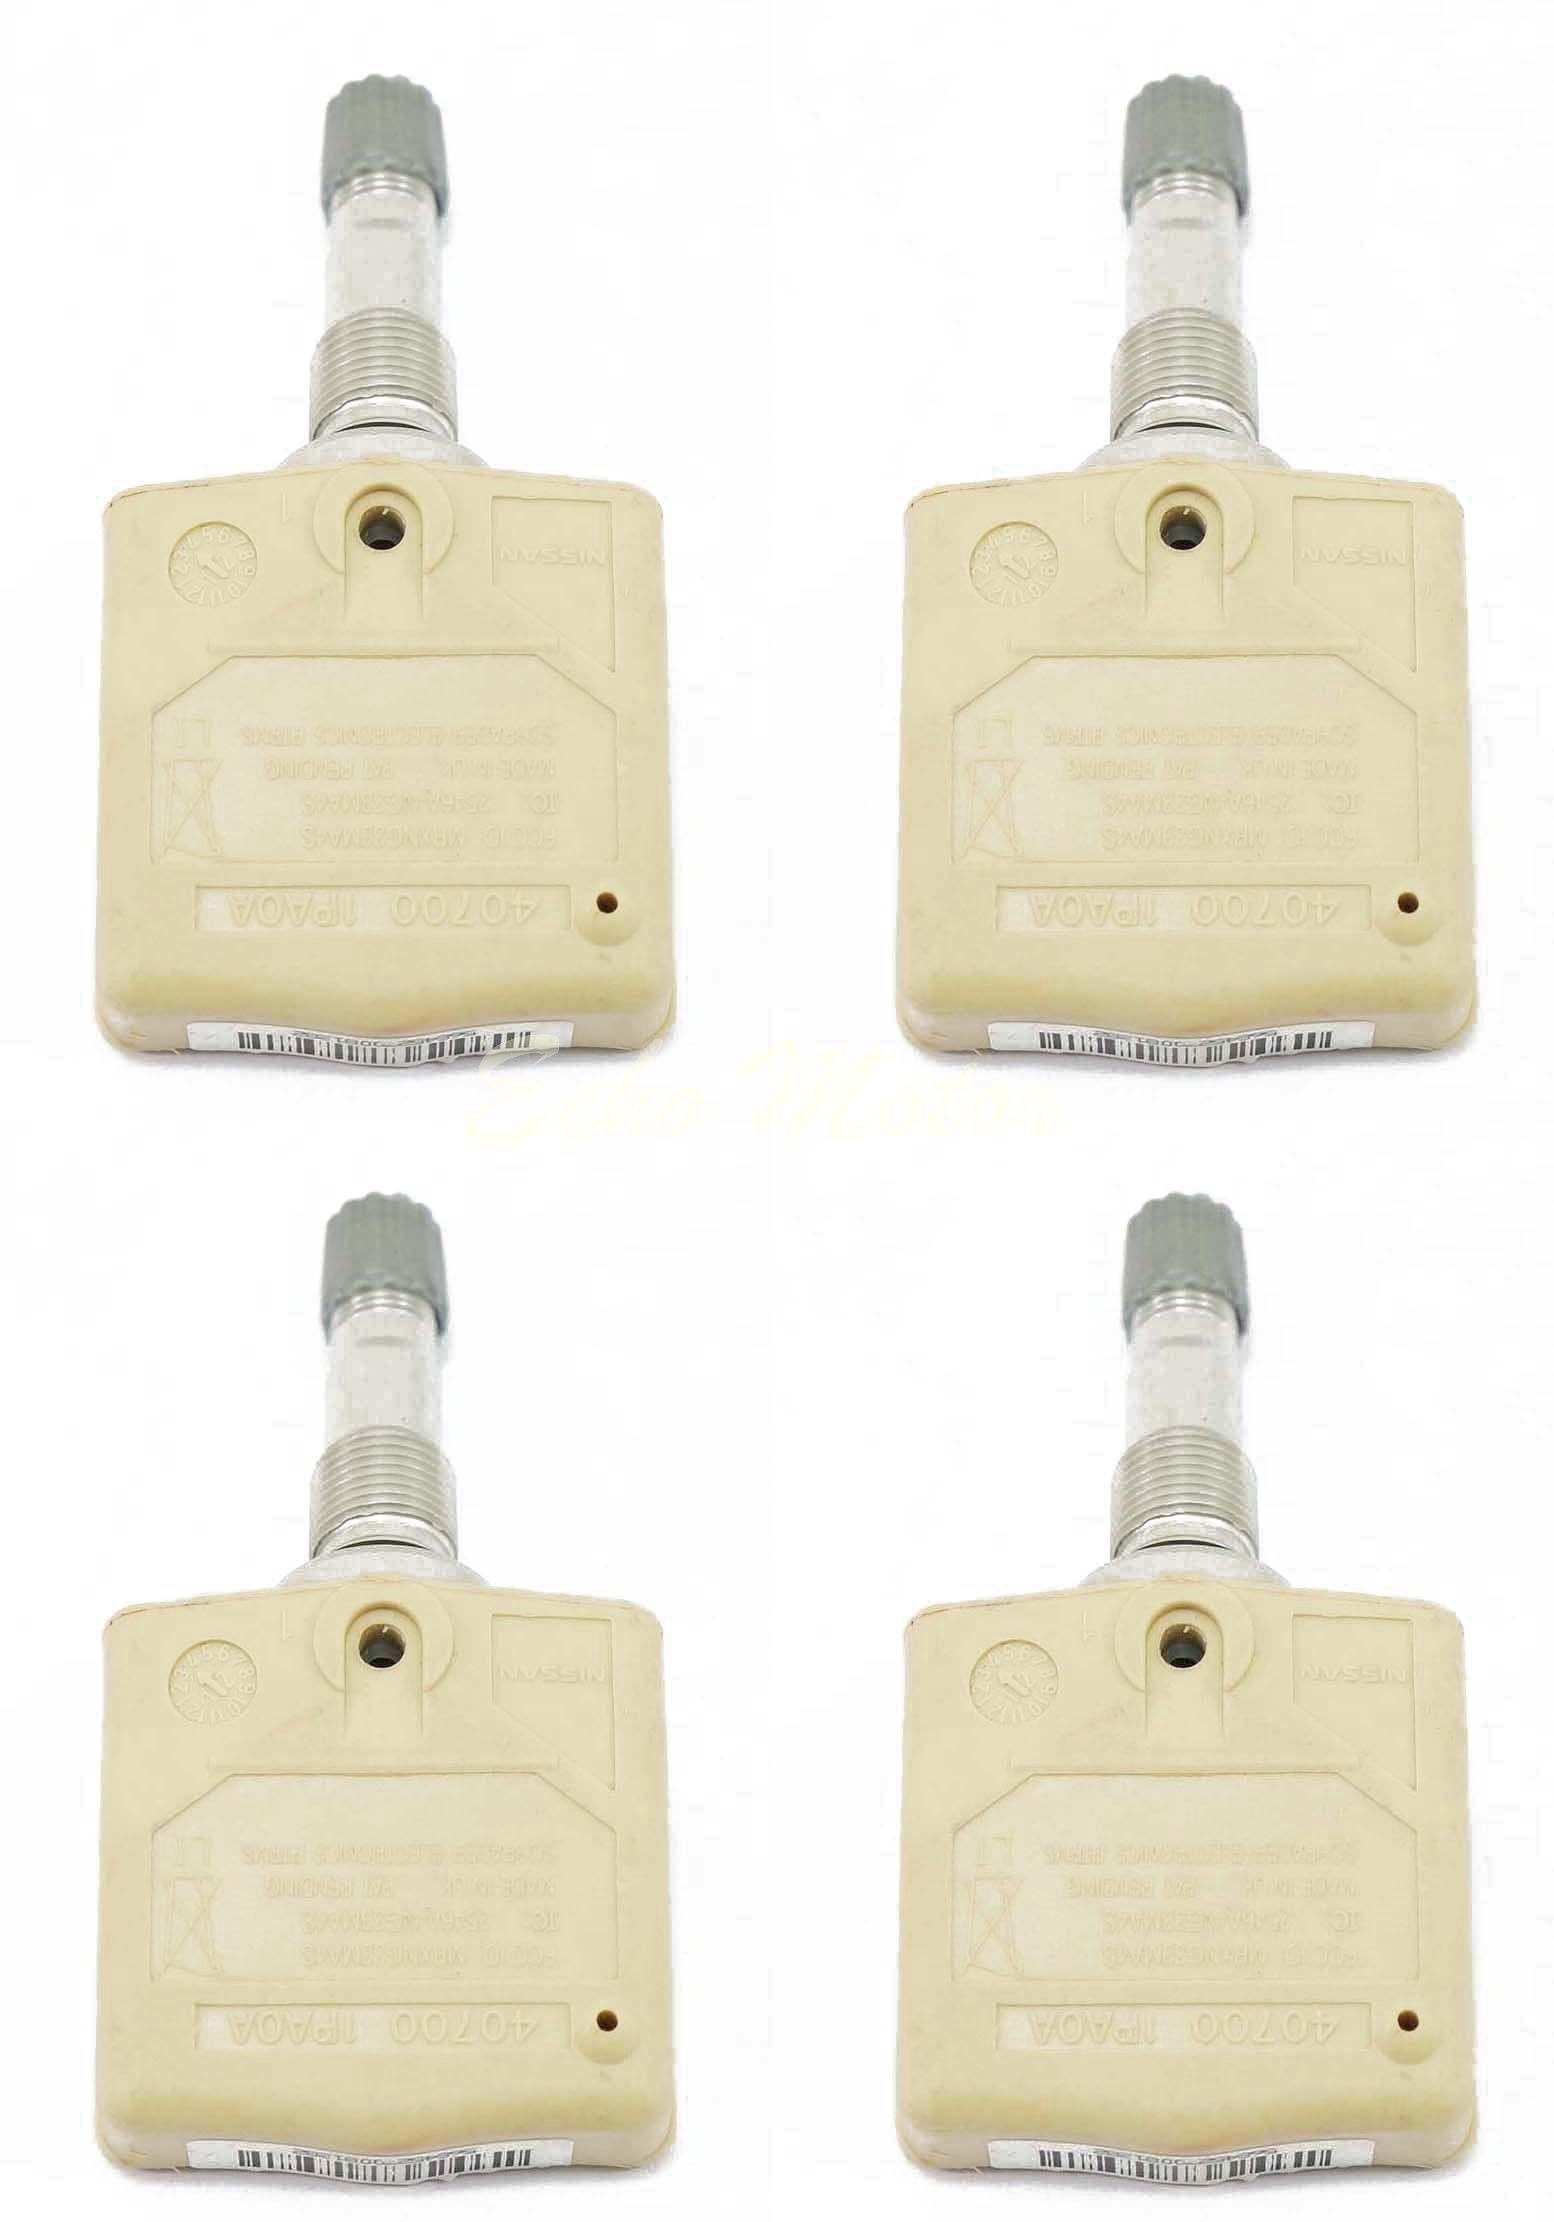 * NEW * Reifendruckkontrollsensor TPMS für Nissan 40700-1PA0A 407001PA0A